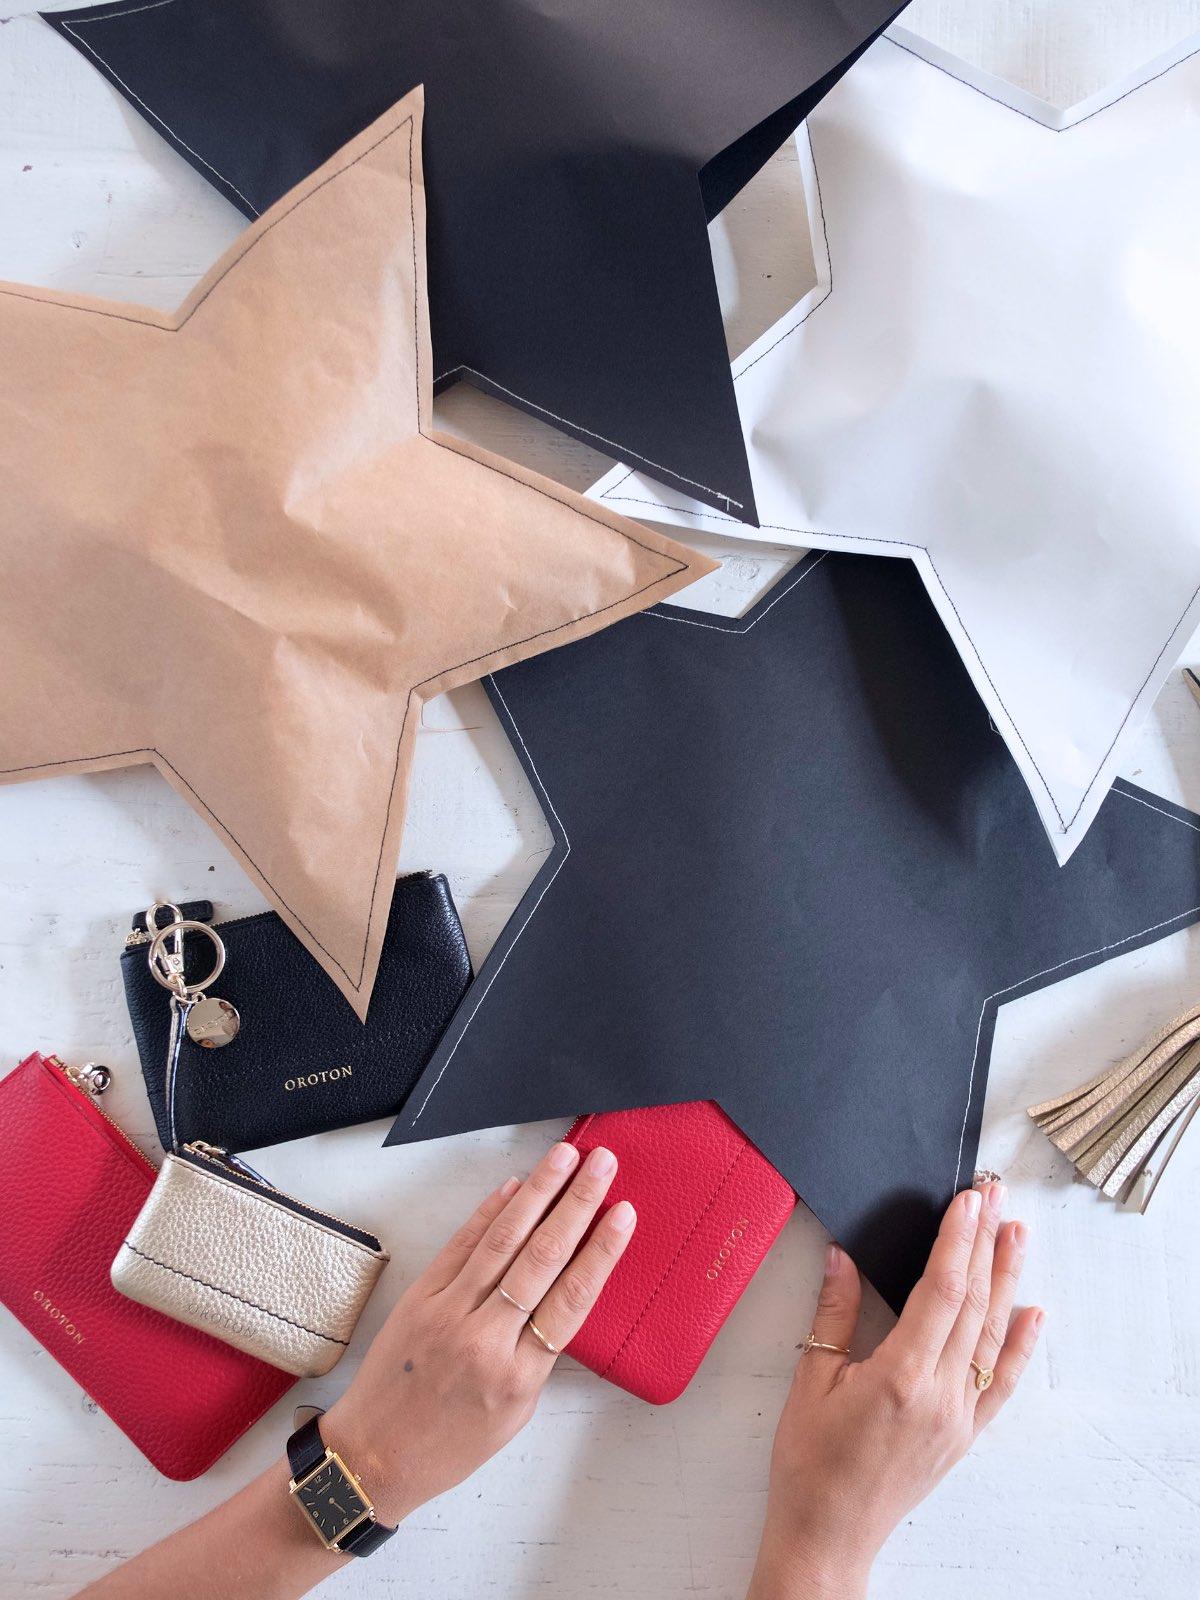 2 Creative Gift Wrapping Ideas - DIY Sewn Stars